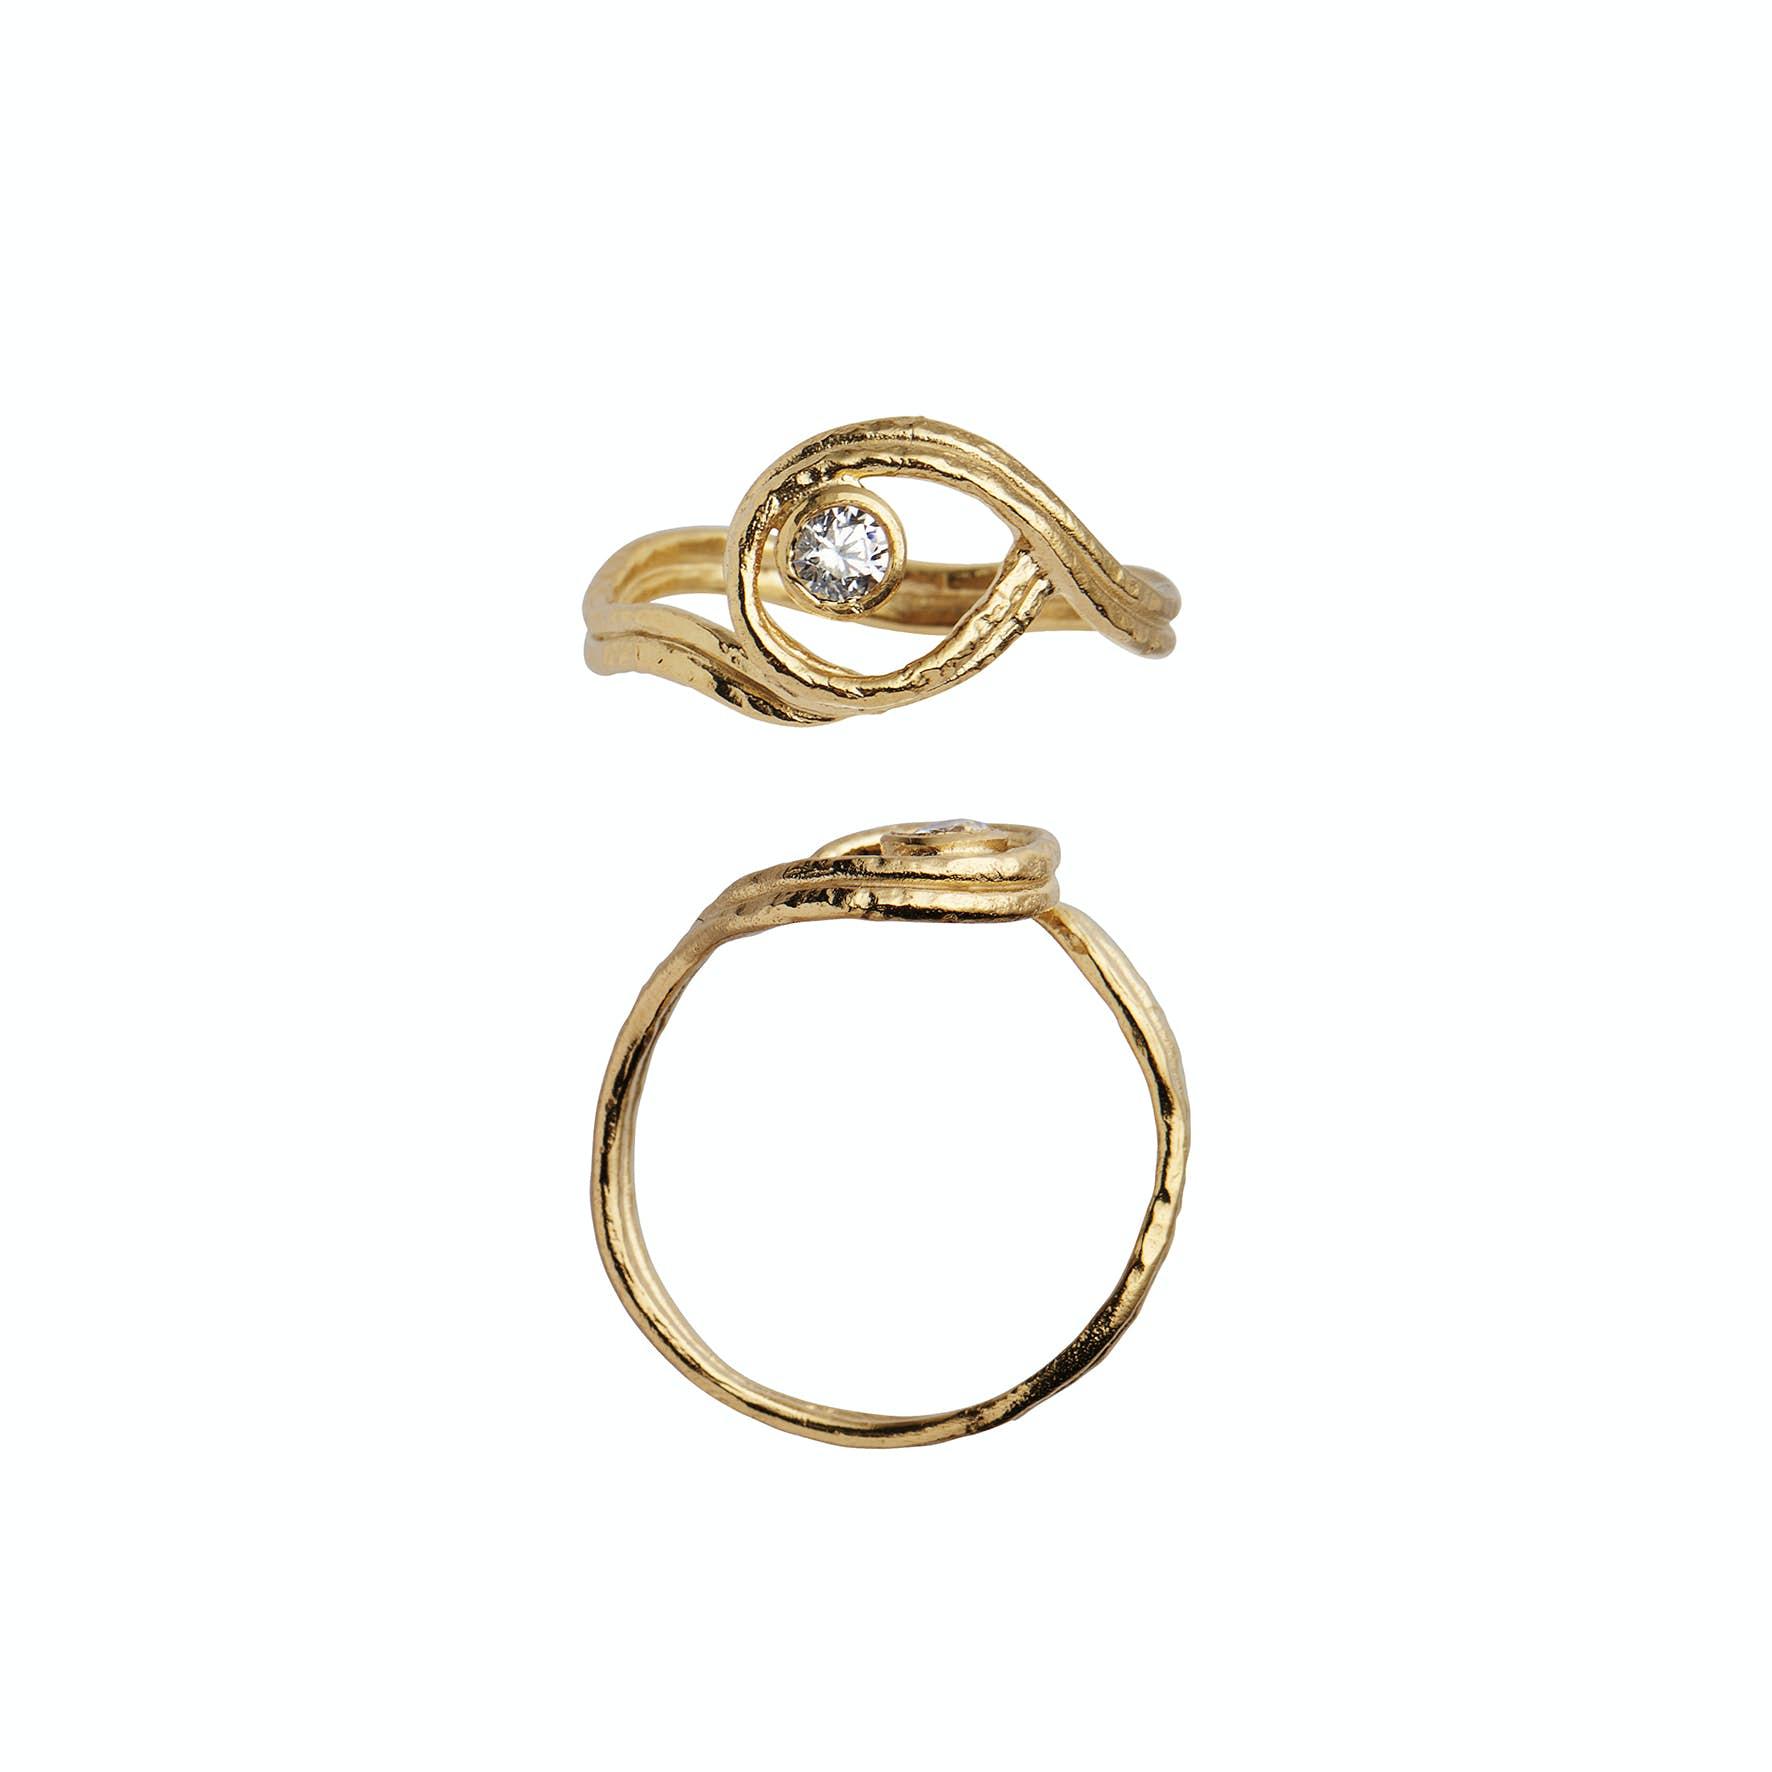 Balance Ring With Stone fra STINE A Jewelry i Forgylt-Sølv Sterling 925